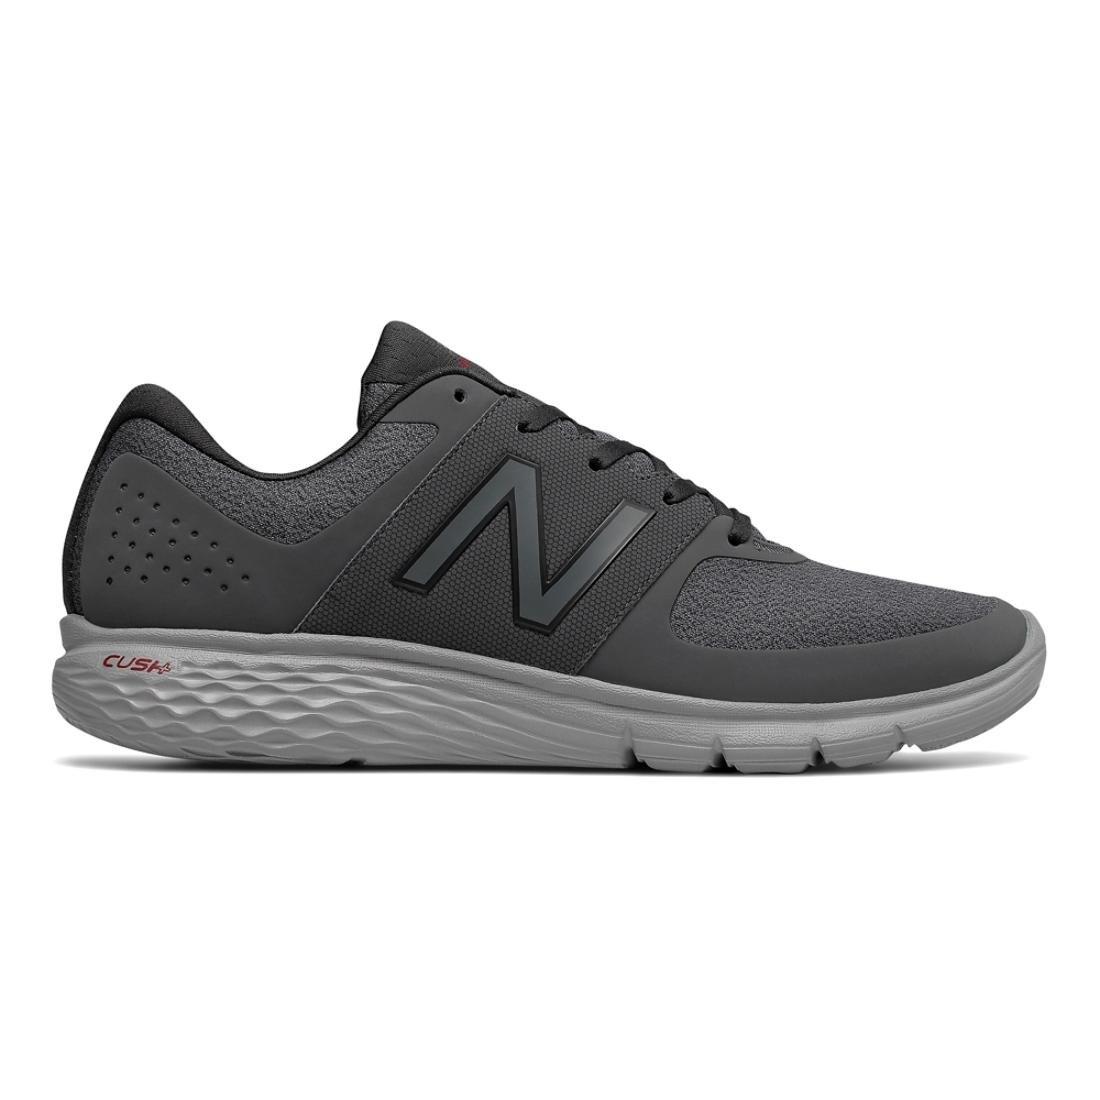 New Balance Men's MA365v1 CUSH + Walking Shoe, Grey, 9.5 4E US